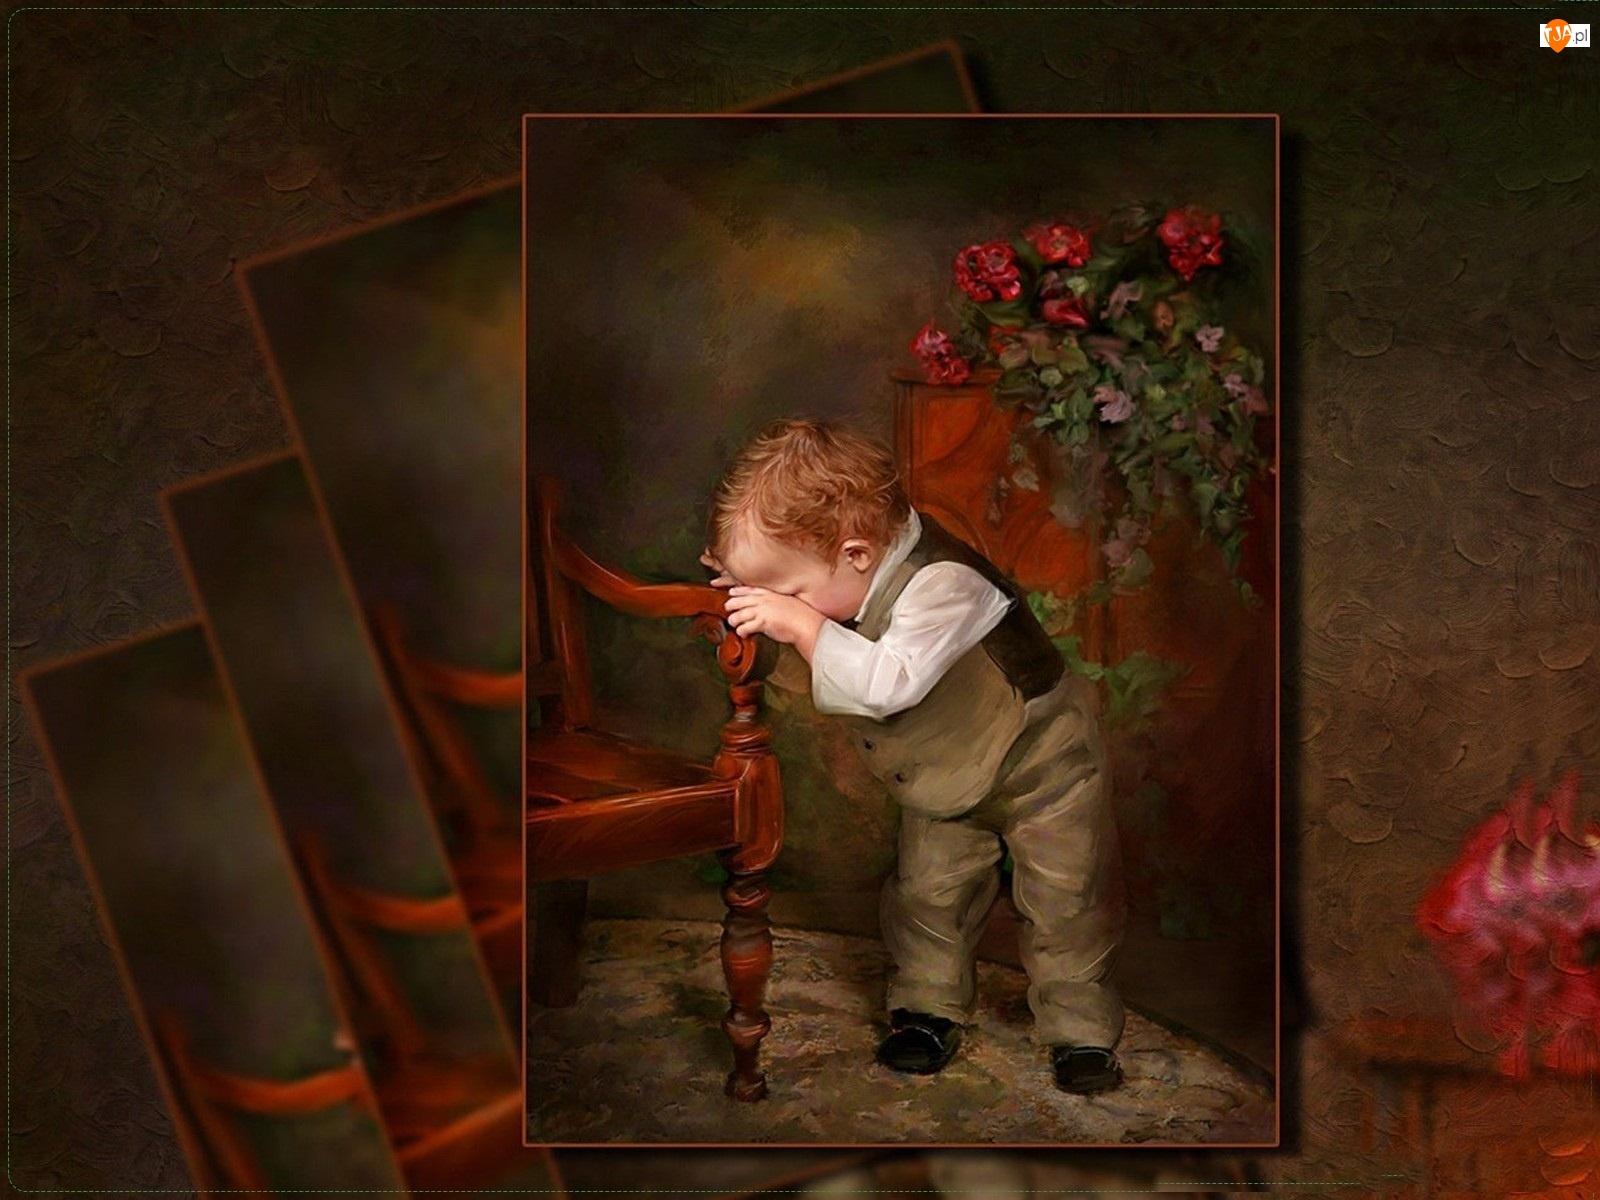 Chłopiec, Richard Ramsey, Malarstwo